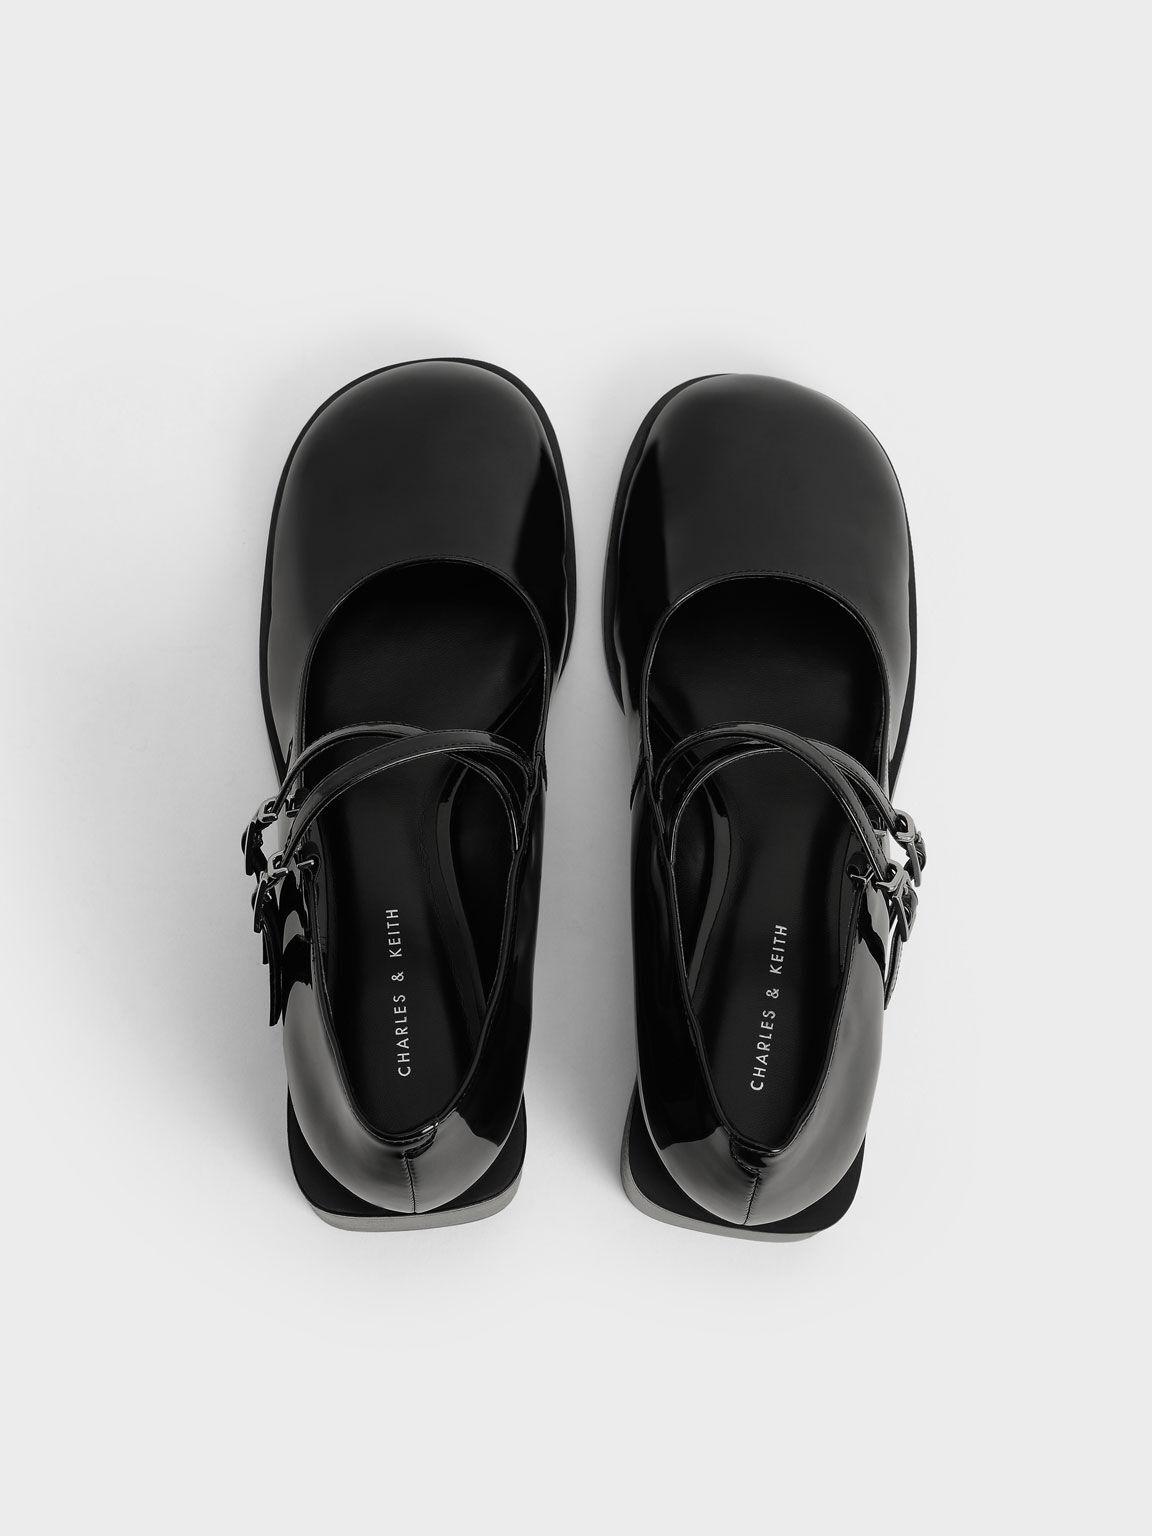 Patent Crossover Block Heel Mary Janes, Black, hi-res